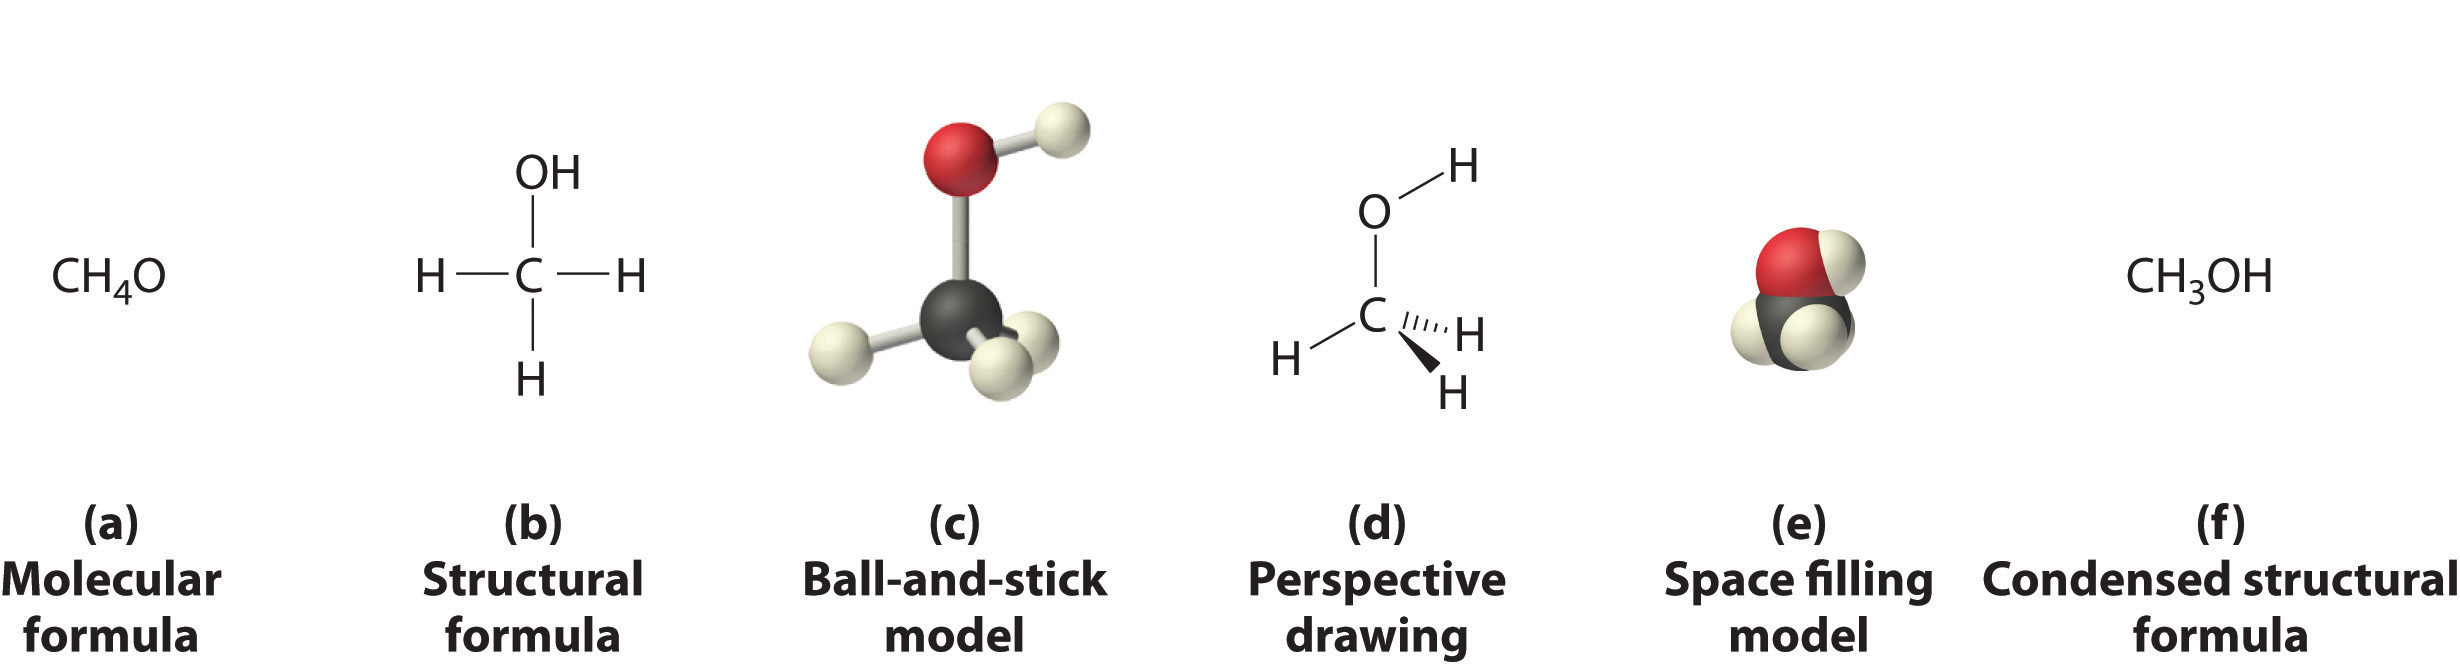 Molecules ions and chemical formulas buycottarizona Choice Image